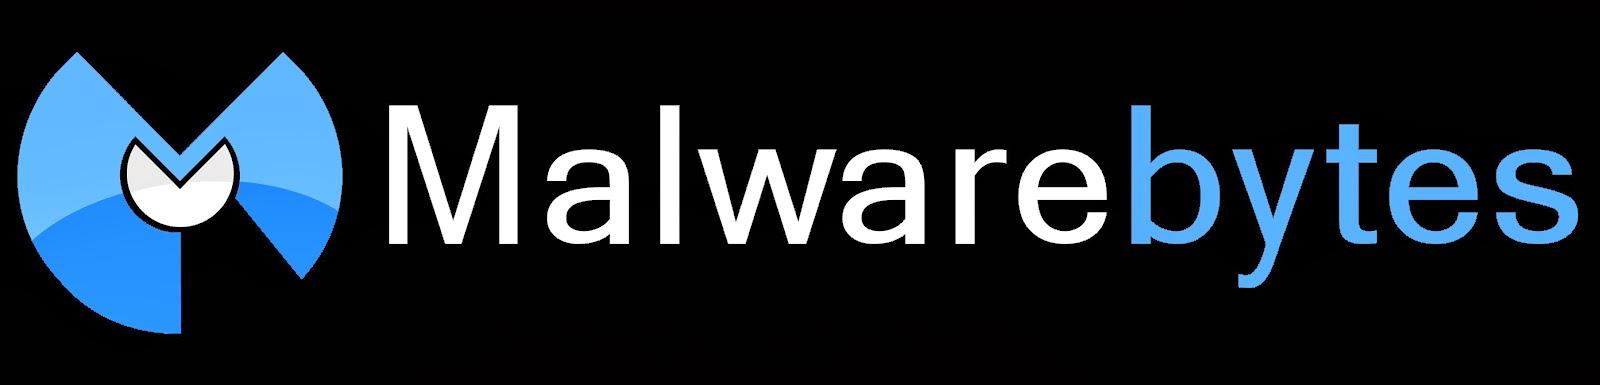 Free Downlaod Malwarebytes, Malwarebytes anti malware